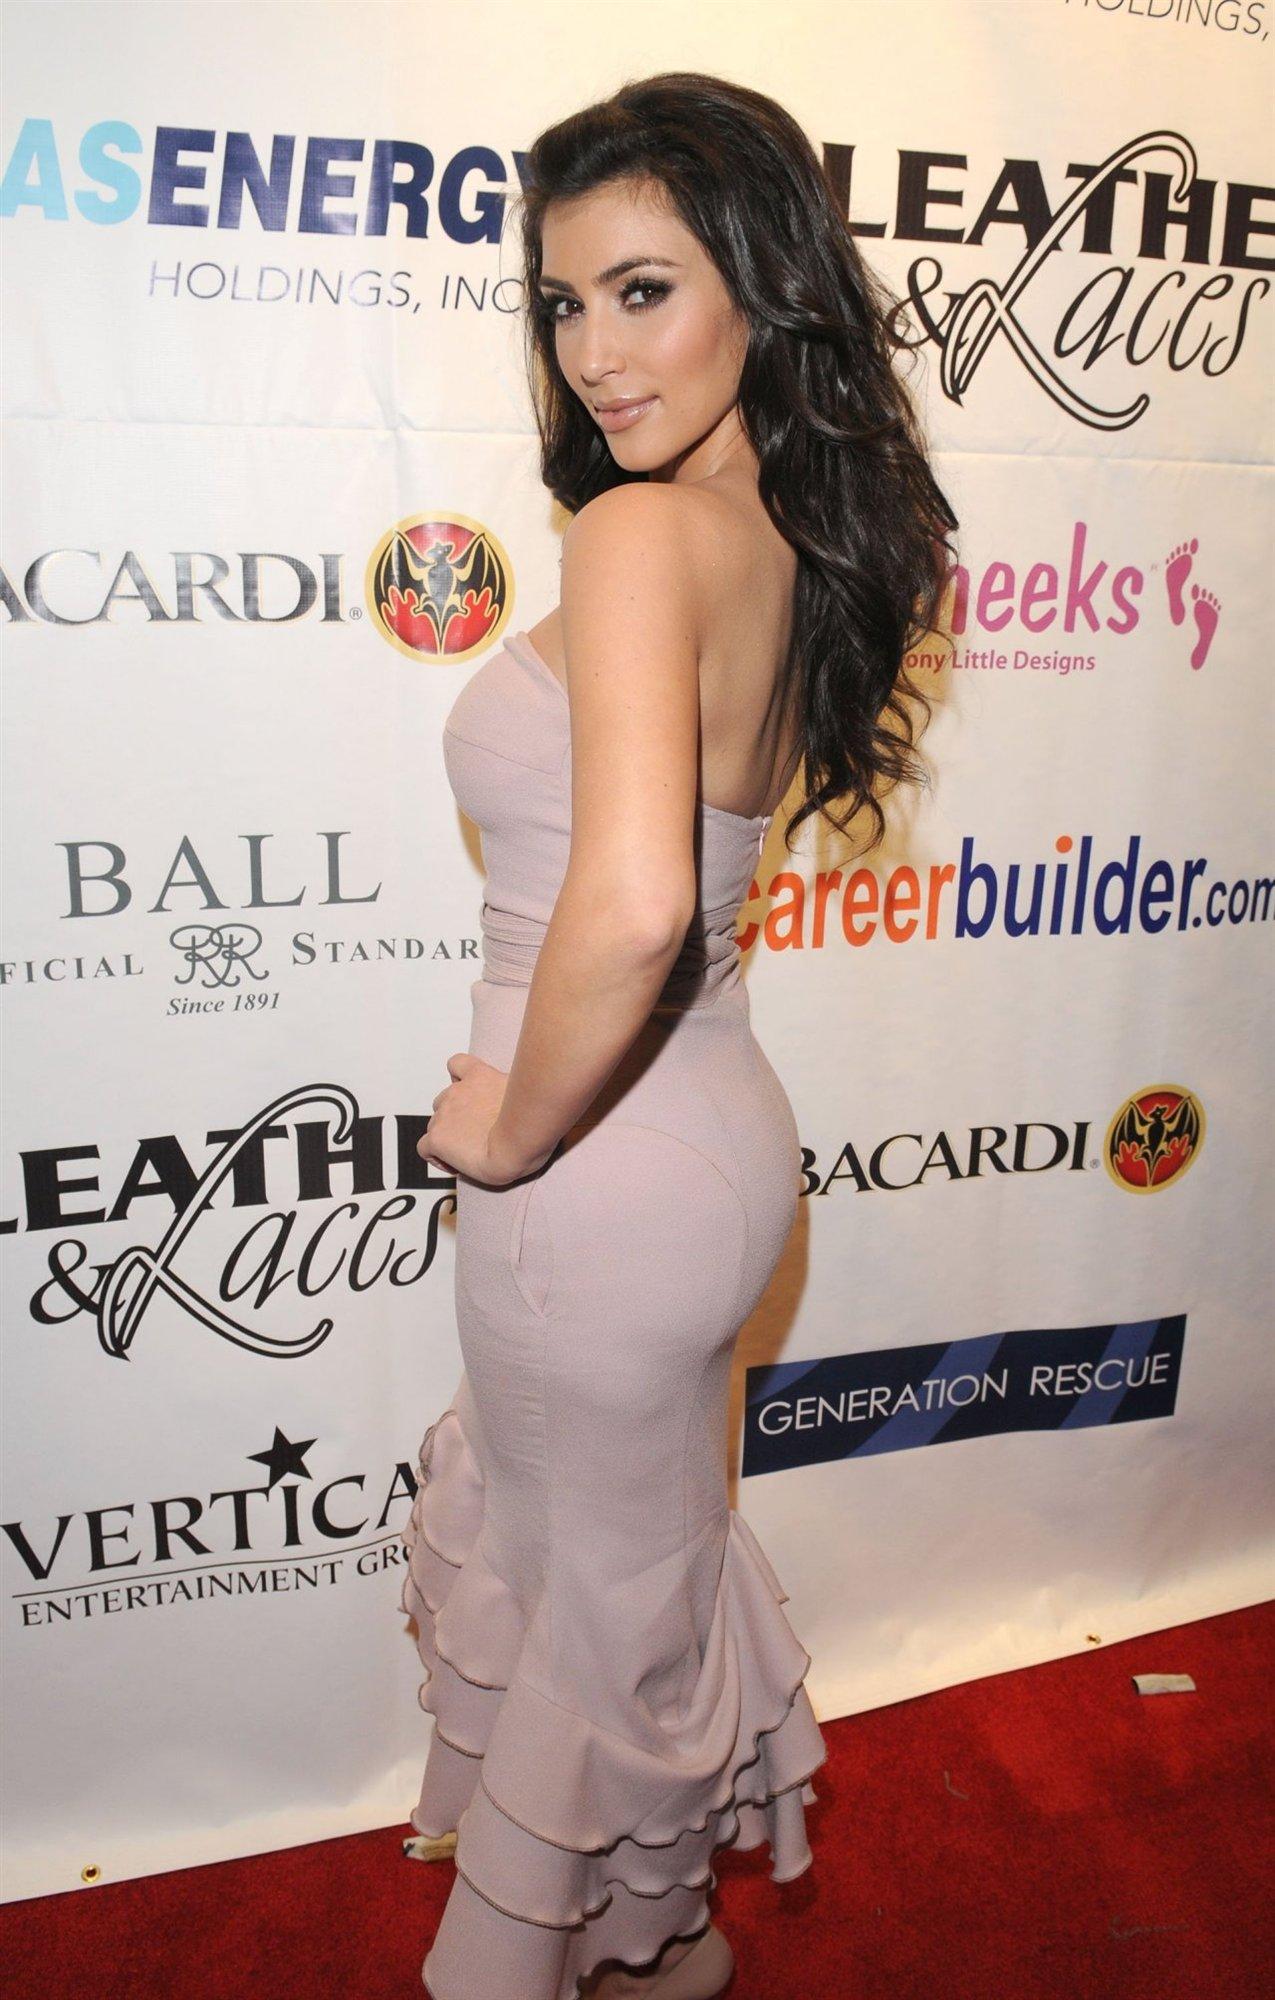 Ким Кардашиан (Ким Kardashian)